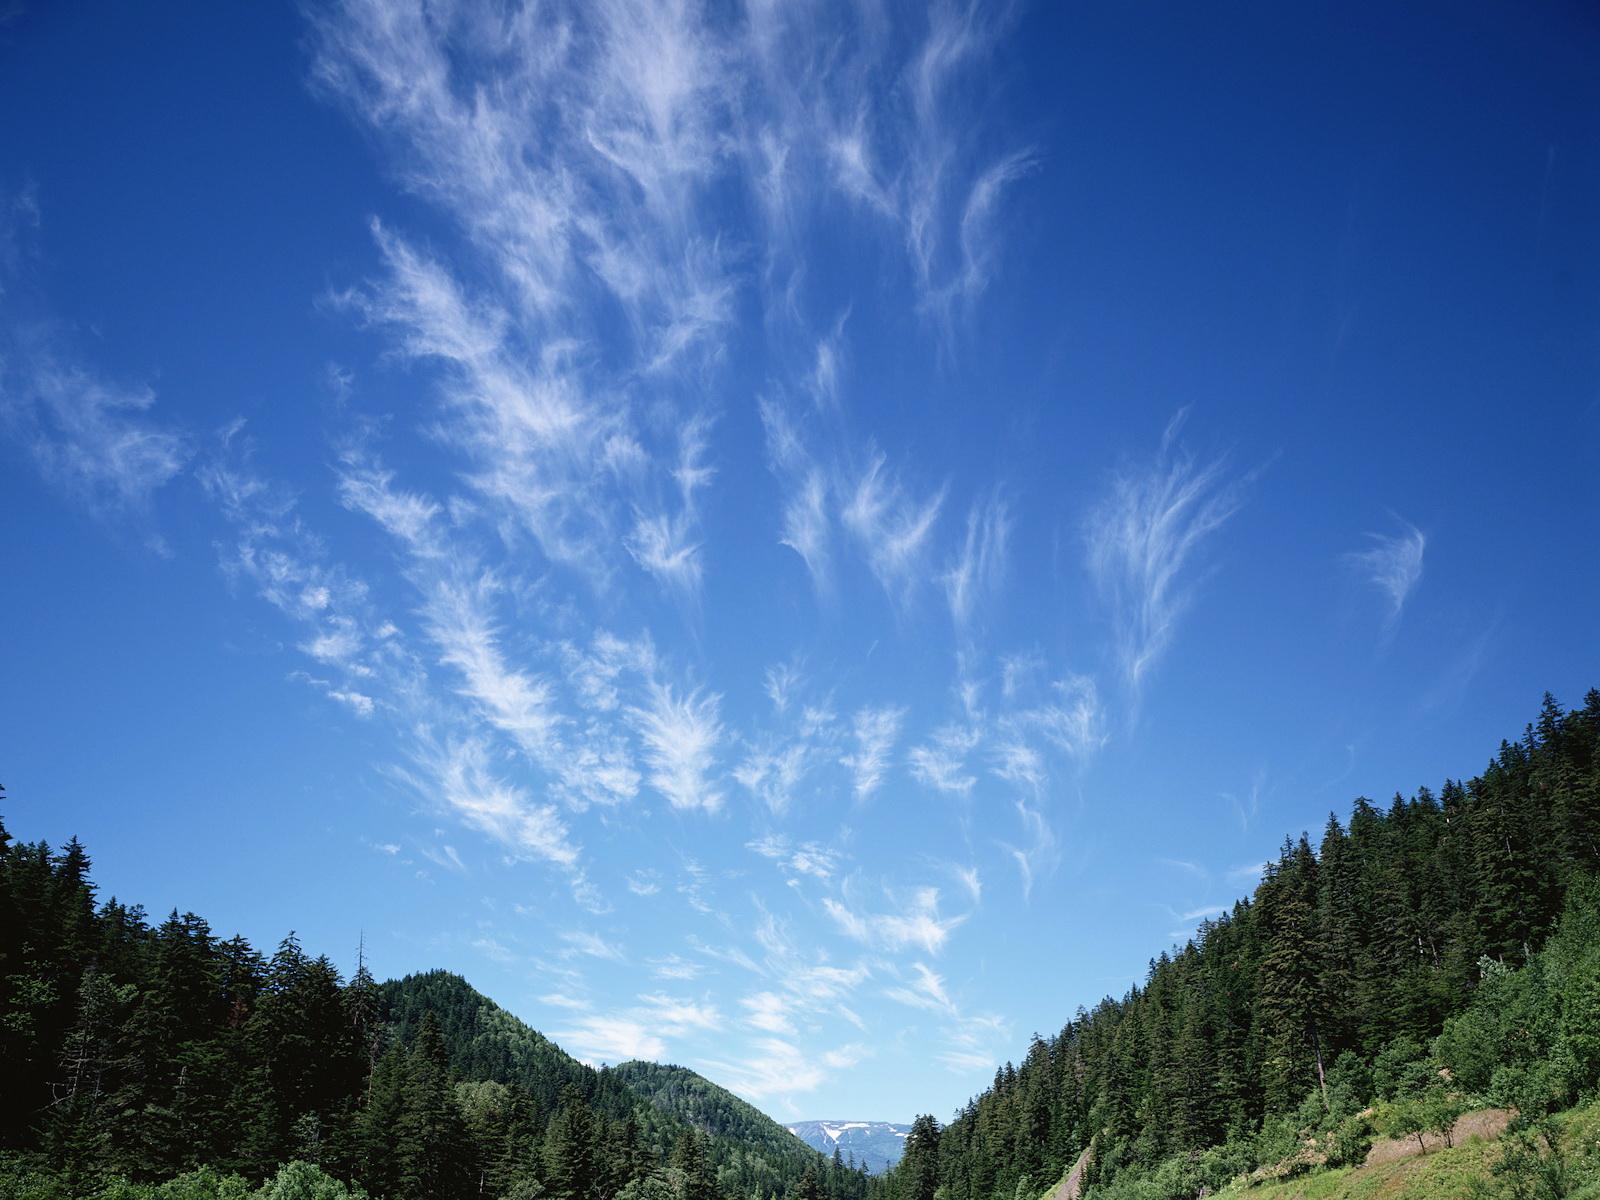 4811-nuages-de-montagne-viaa